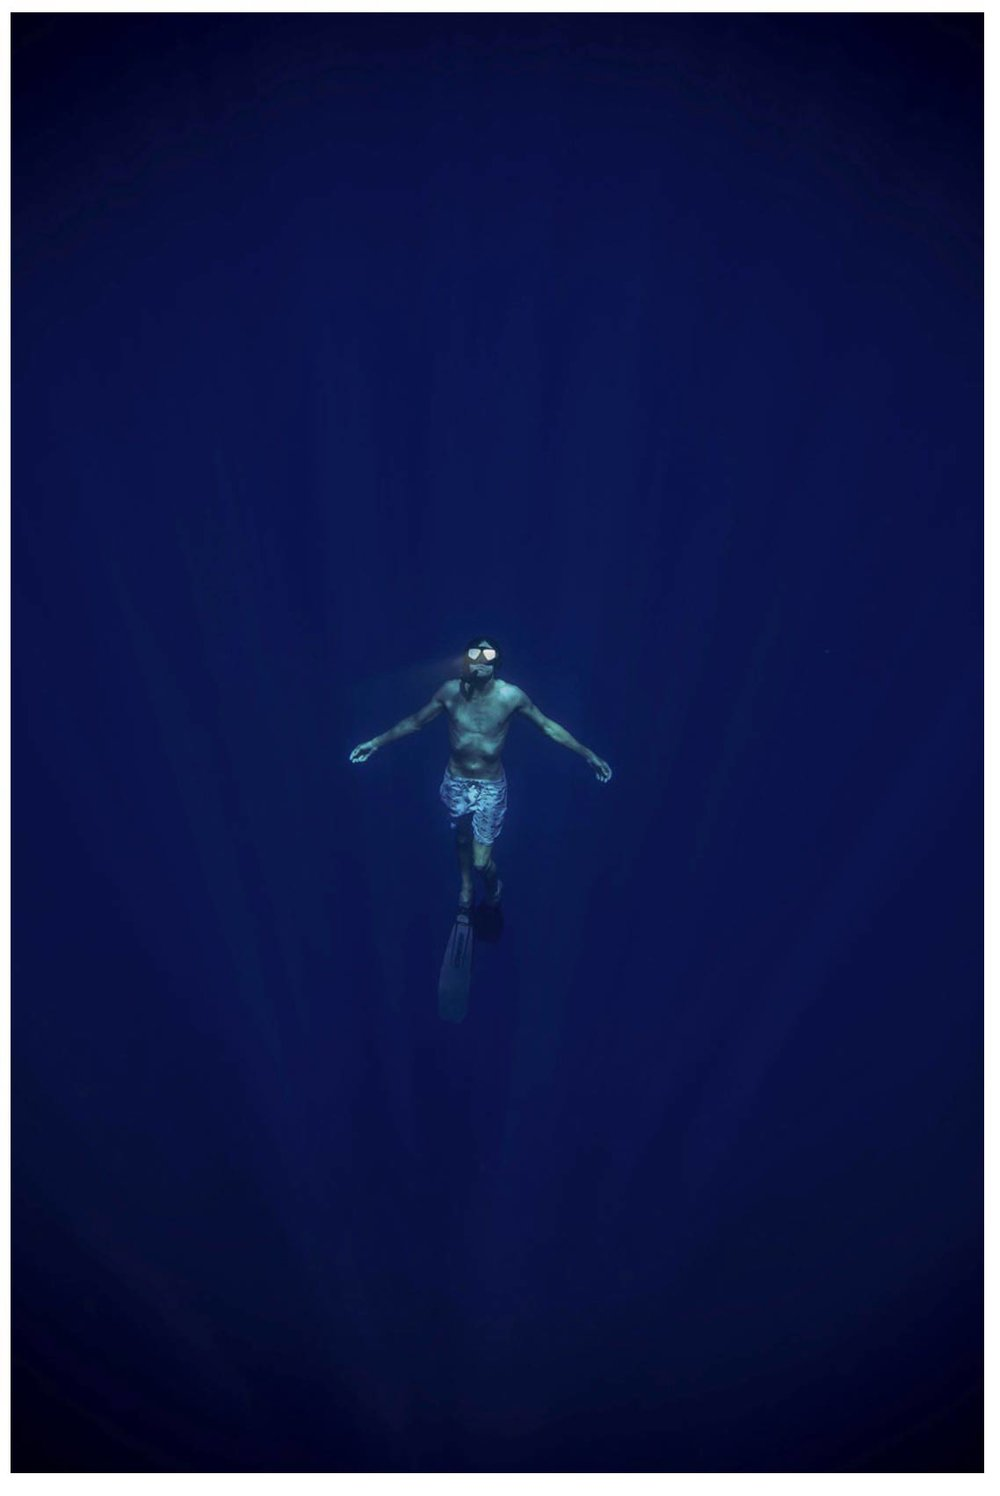 rodd-owen-ocean-surf-photography-for-sale-drone-065.jpg